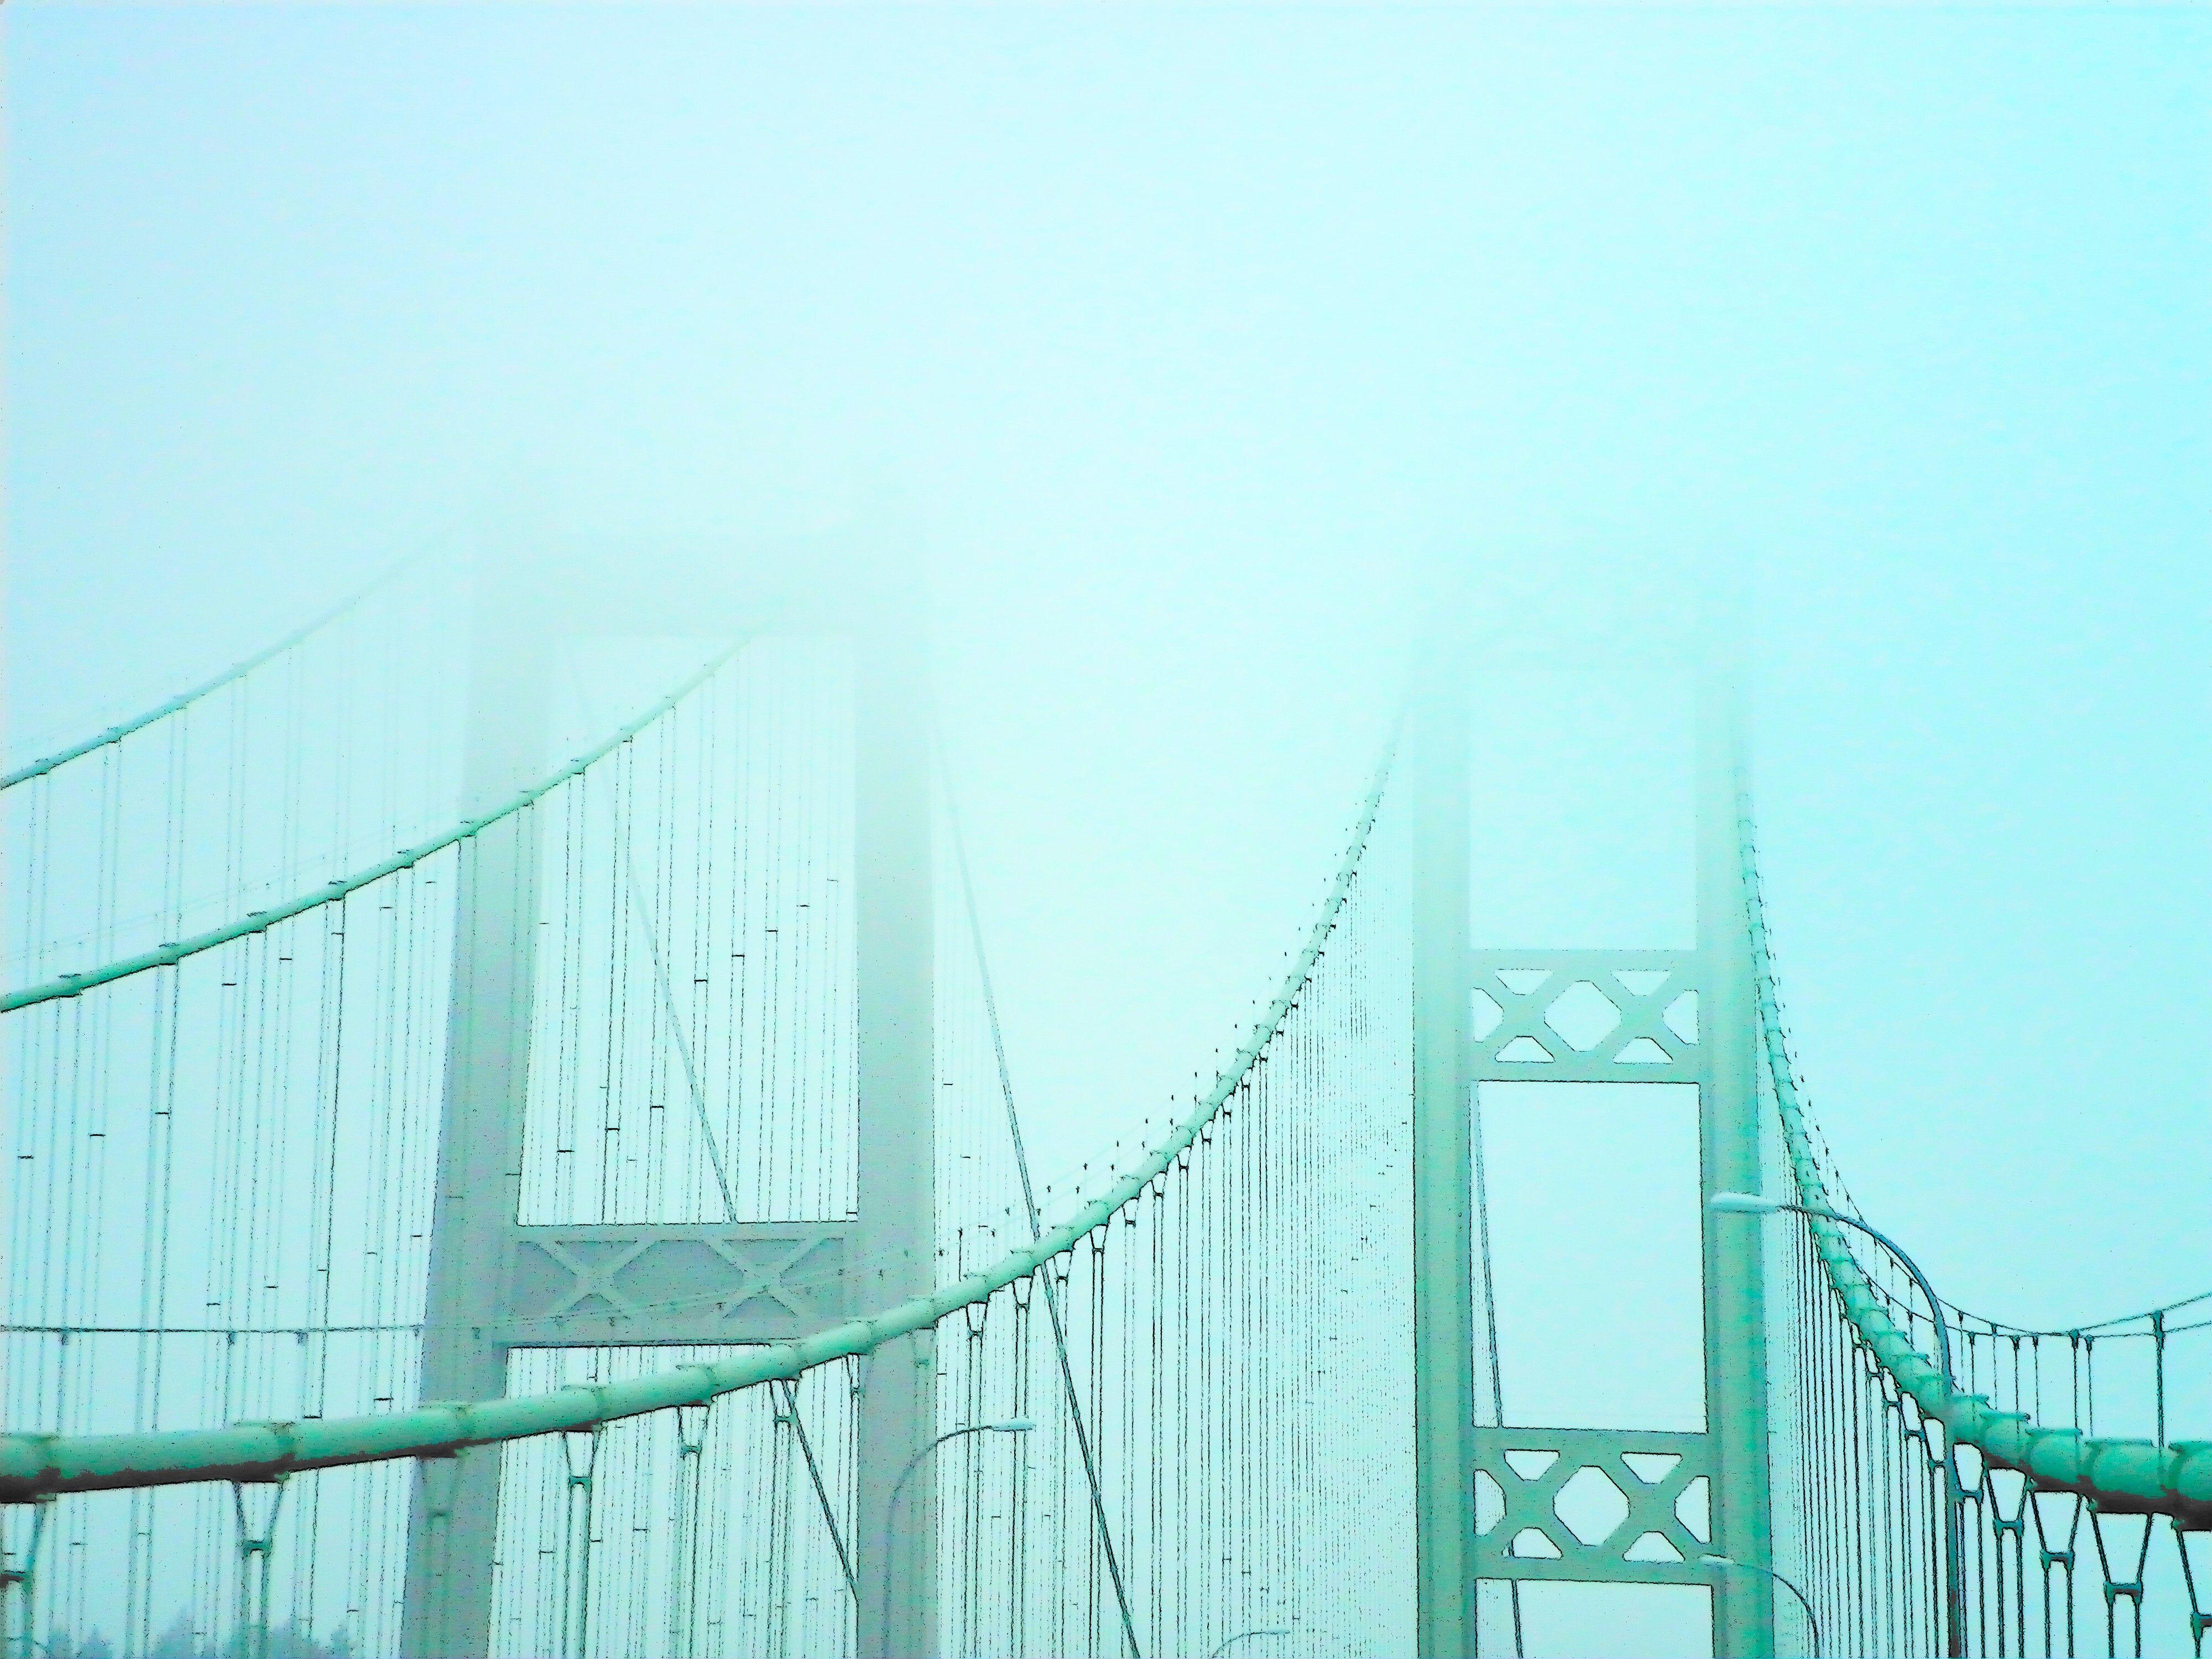 Bridges - Tacoma WA. Home :)